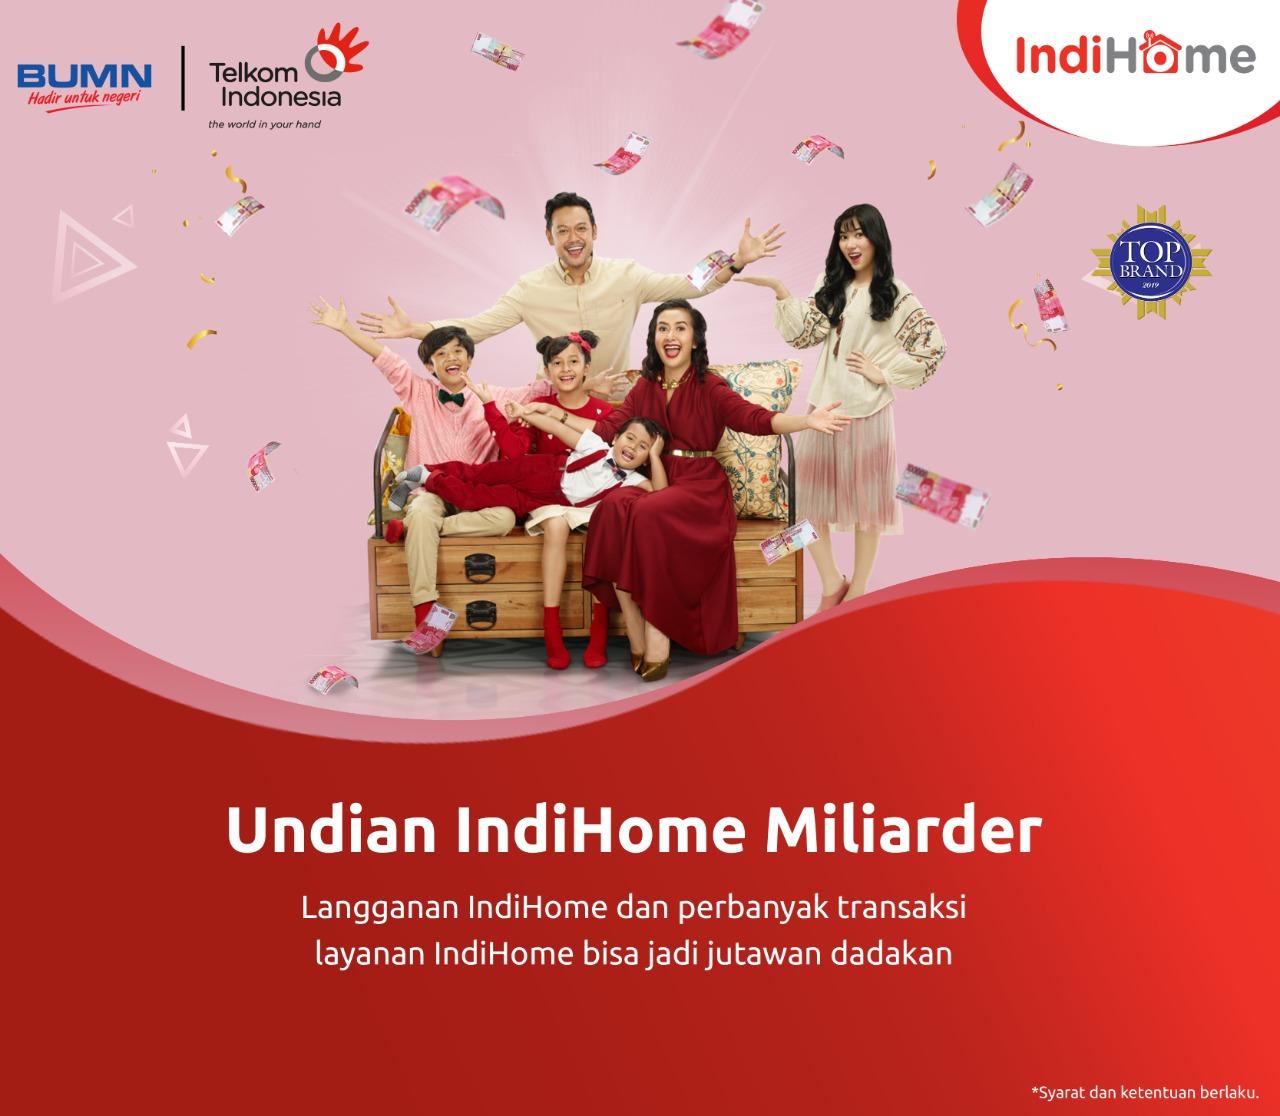 Undian-IndiHome-Miliarder_75525_M.jpg